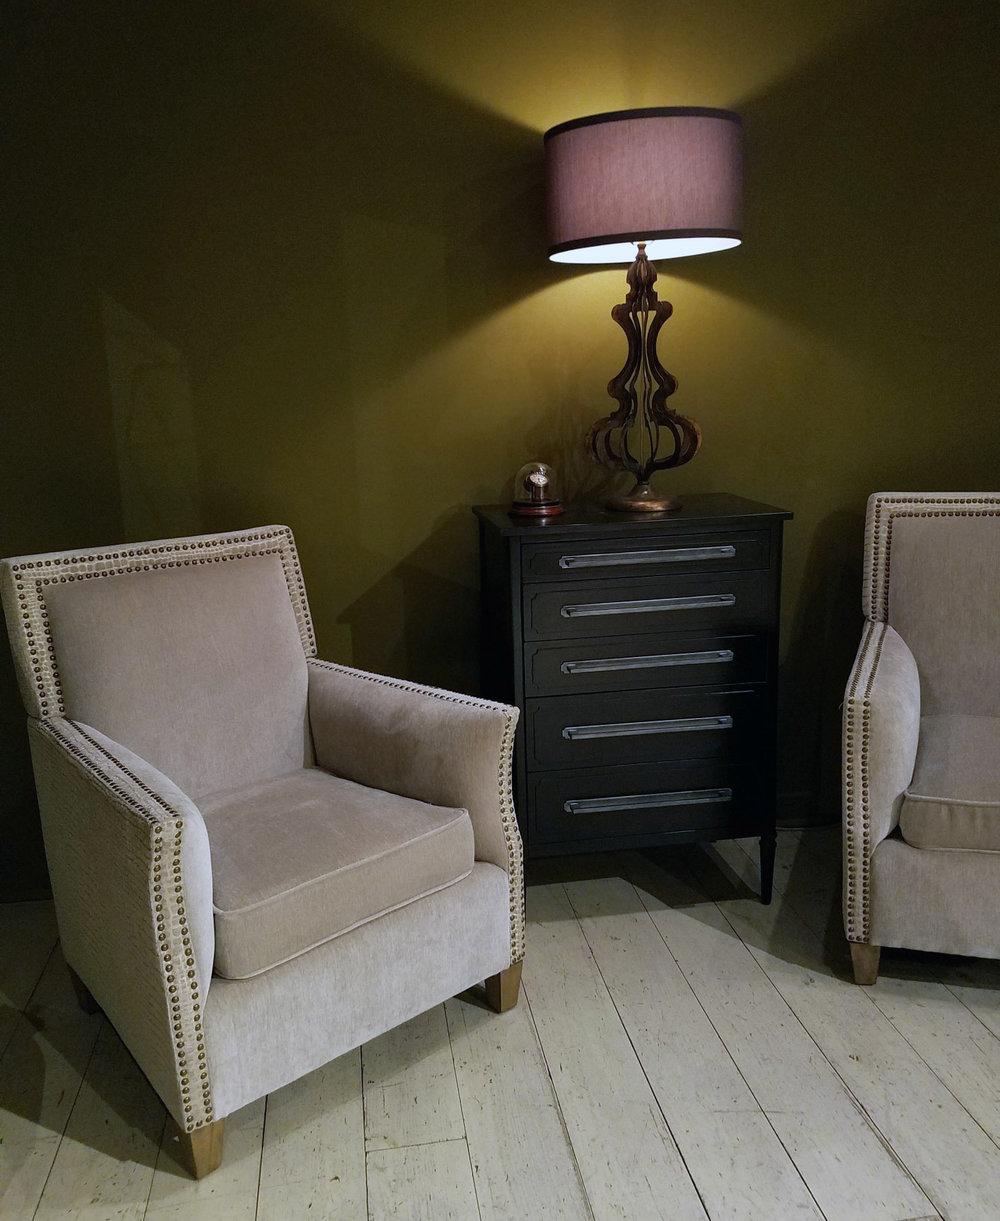 Linvilles chair 2.jpg